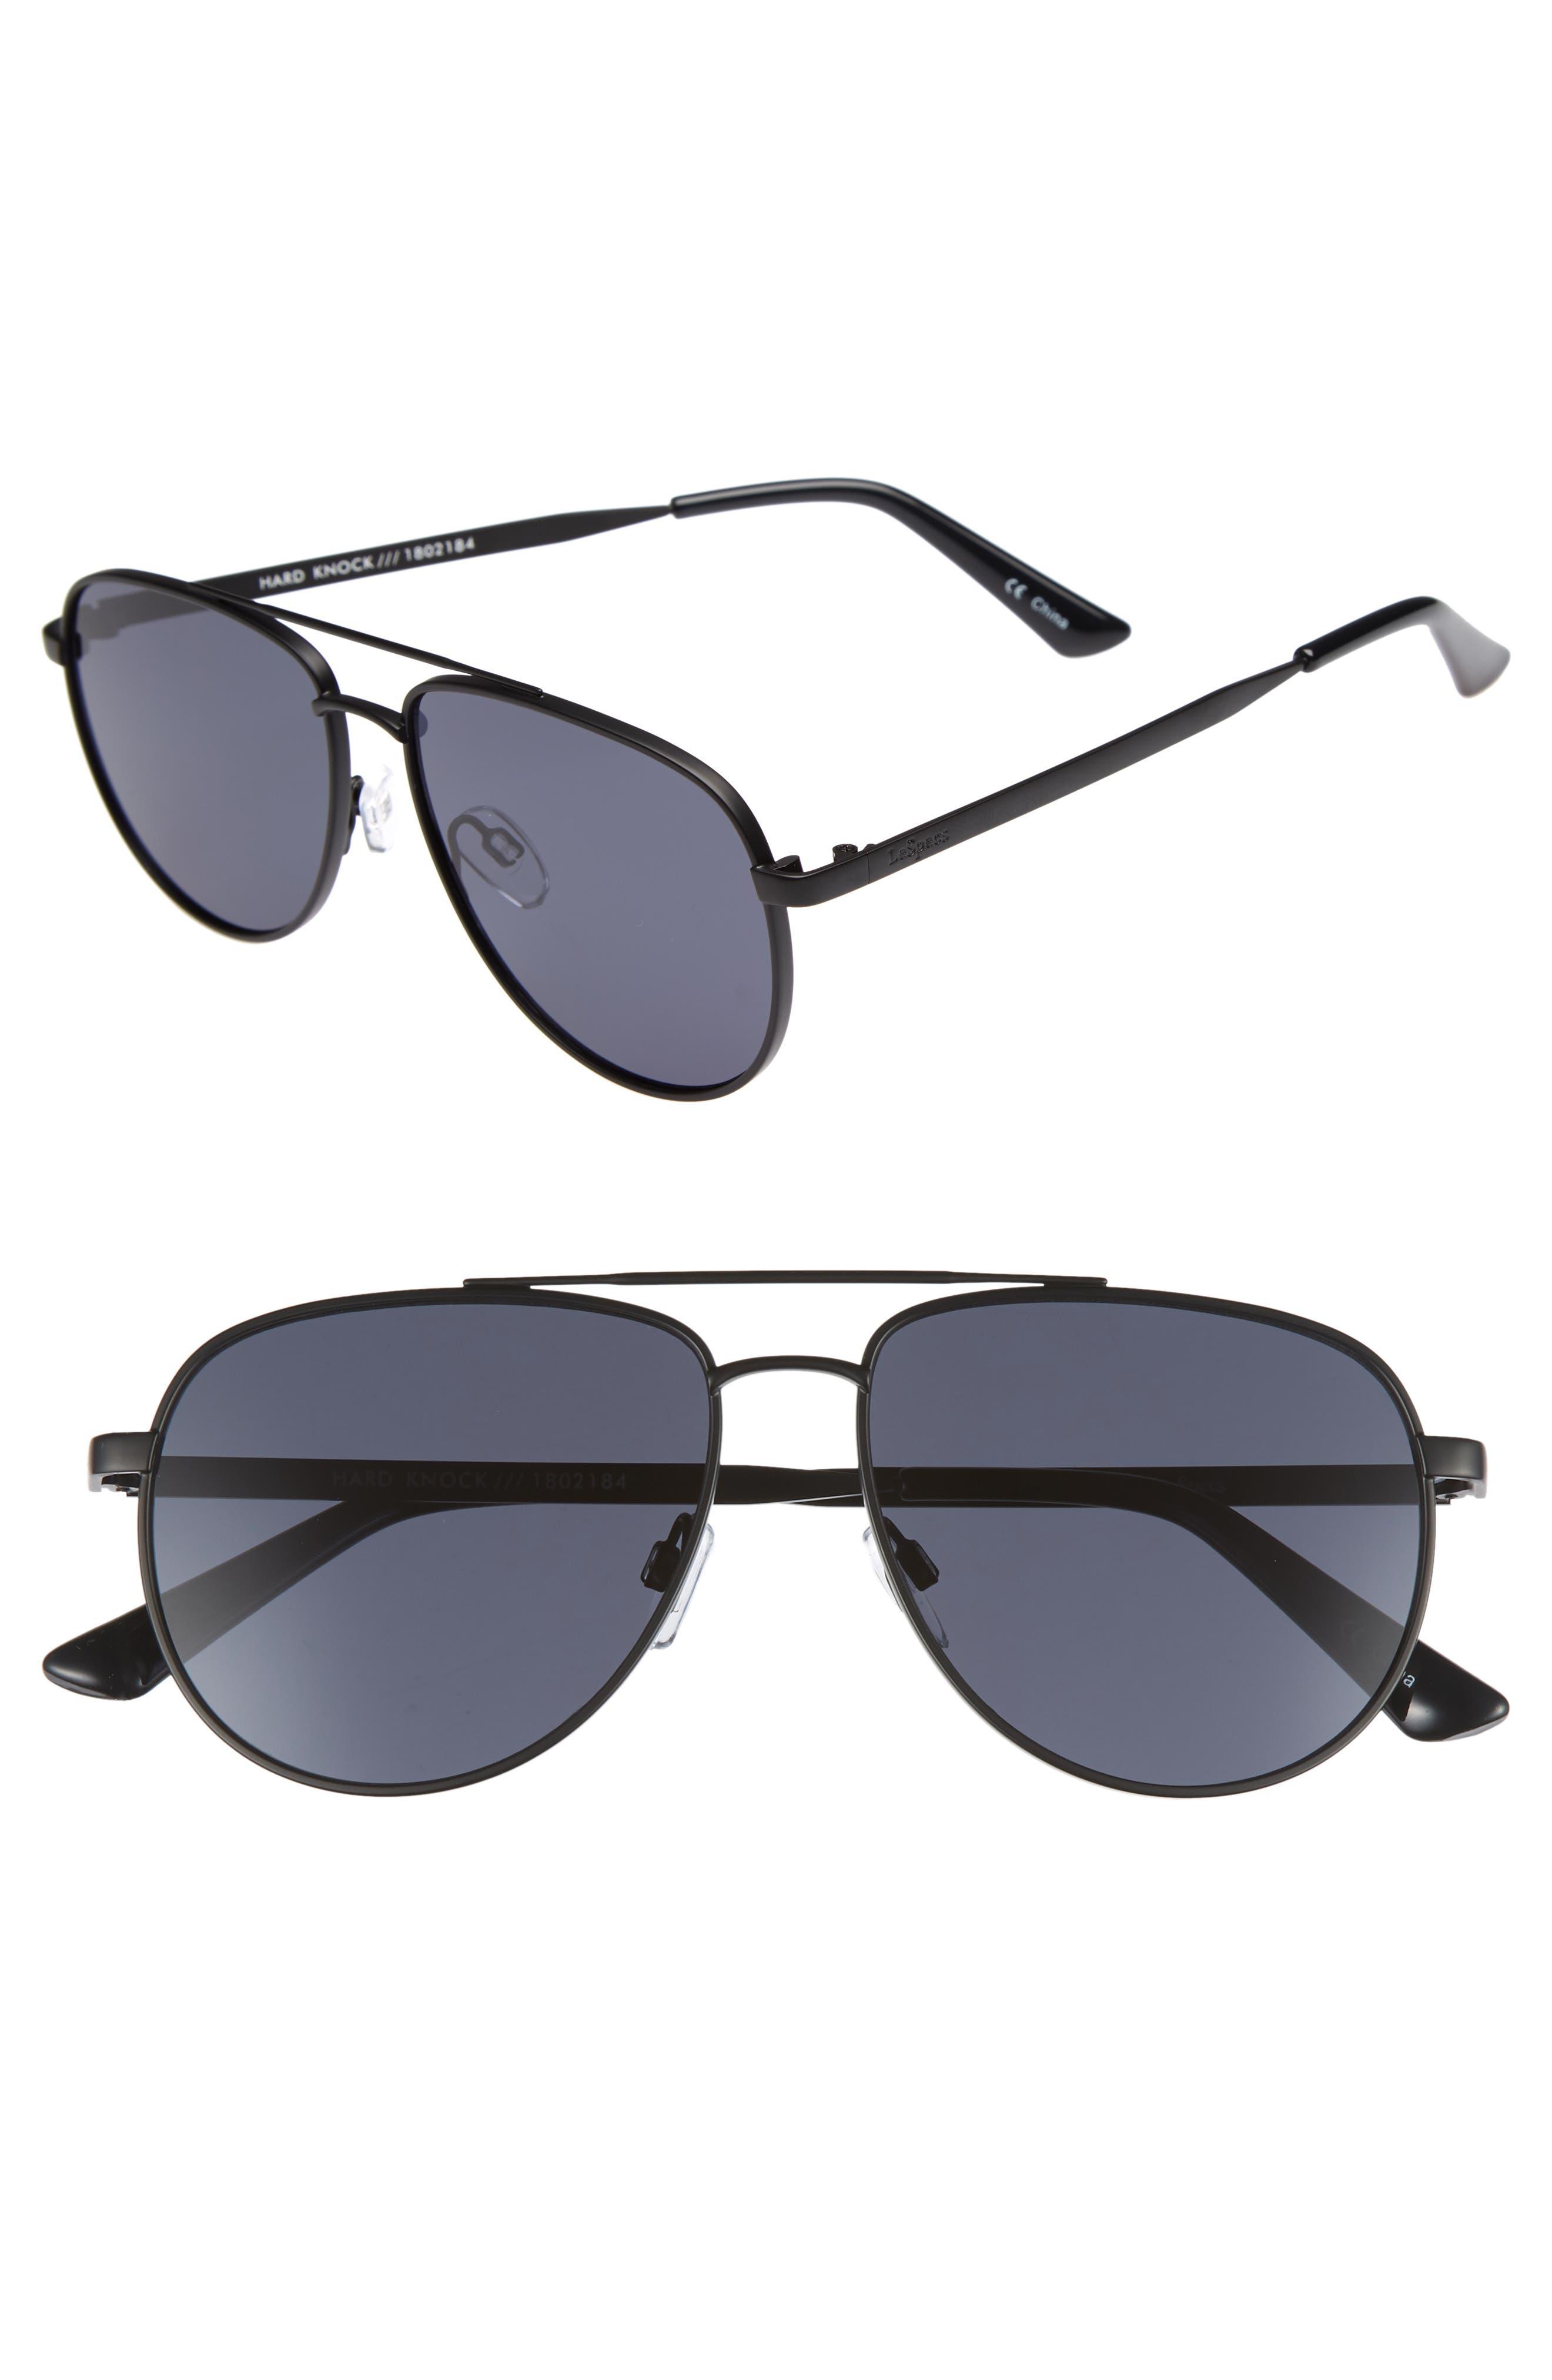 Hard Knock 57mm Aviator Sunglasses,                             Main thumbnail 1, color,                             MATTE BLACK